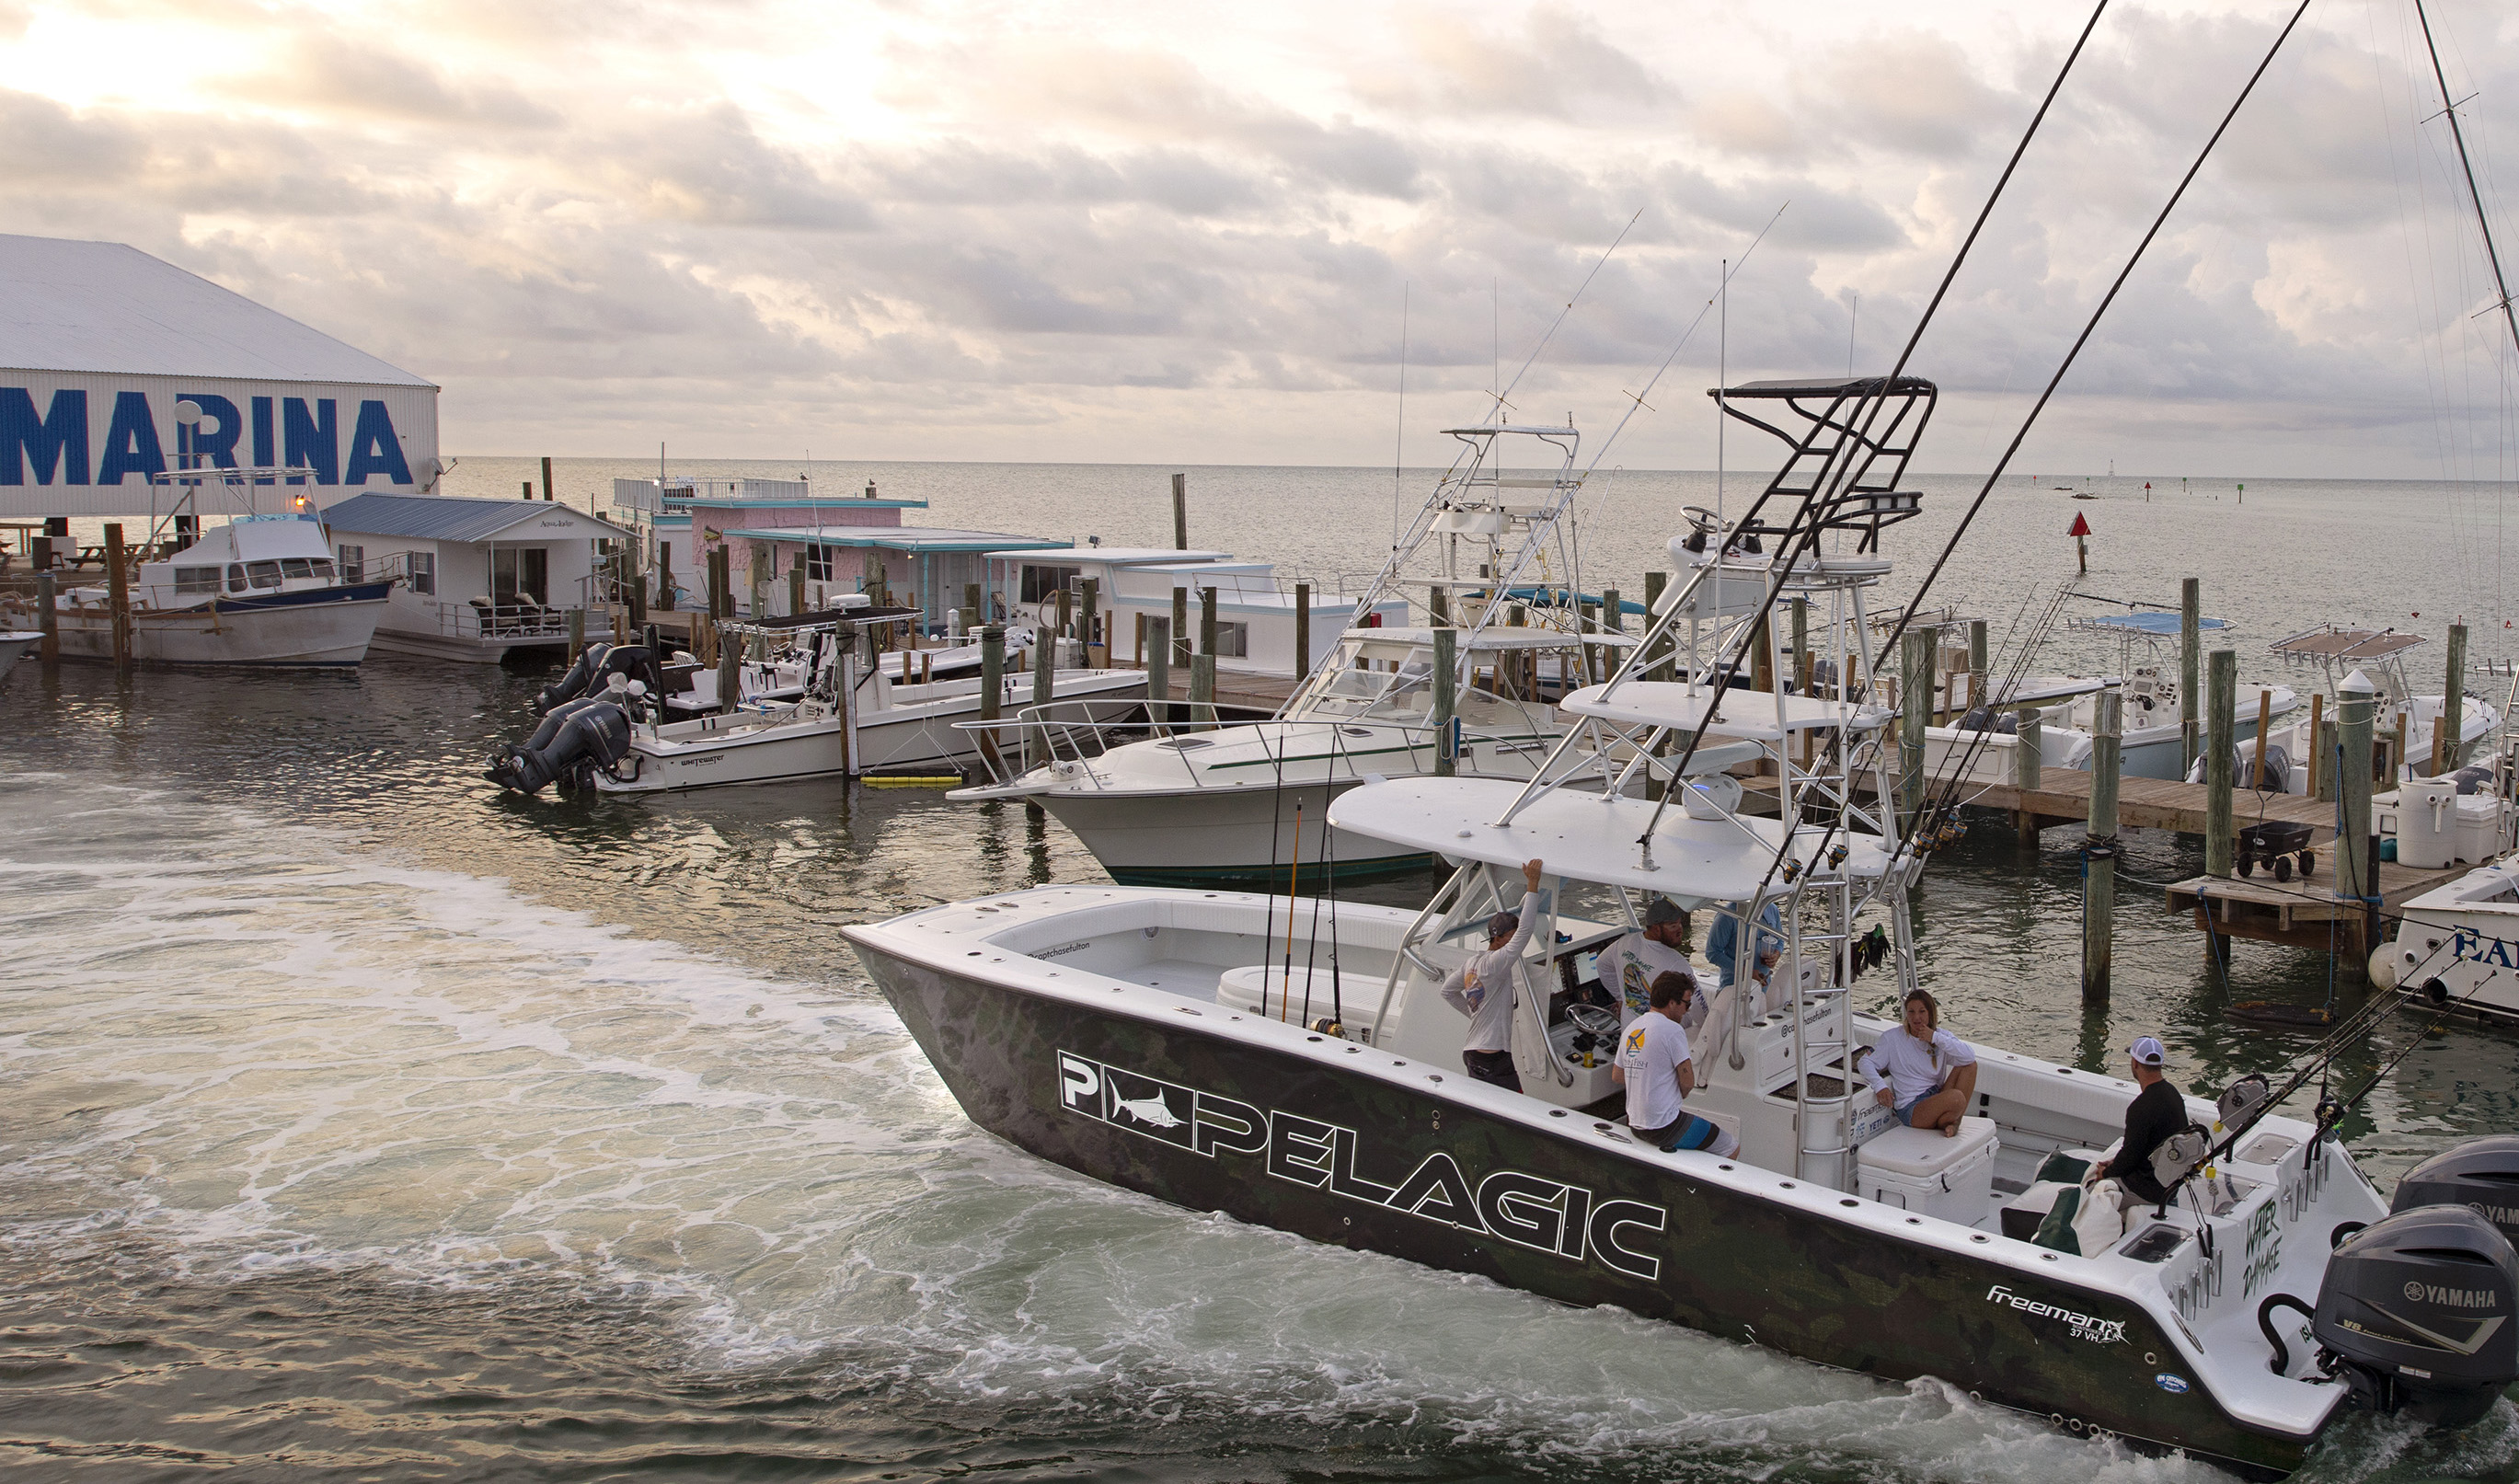 Charter fishing boat departs from marina.